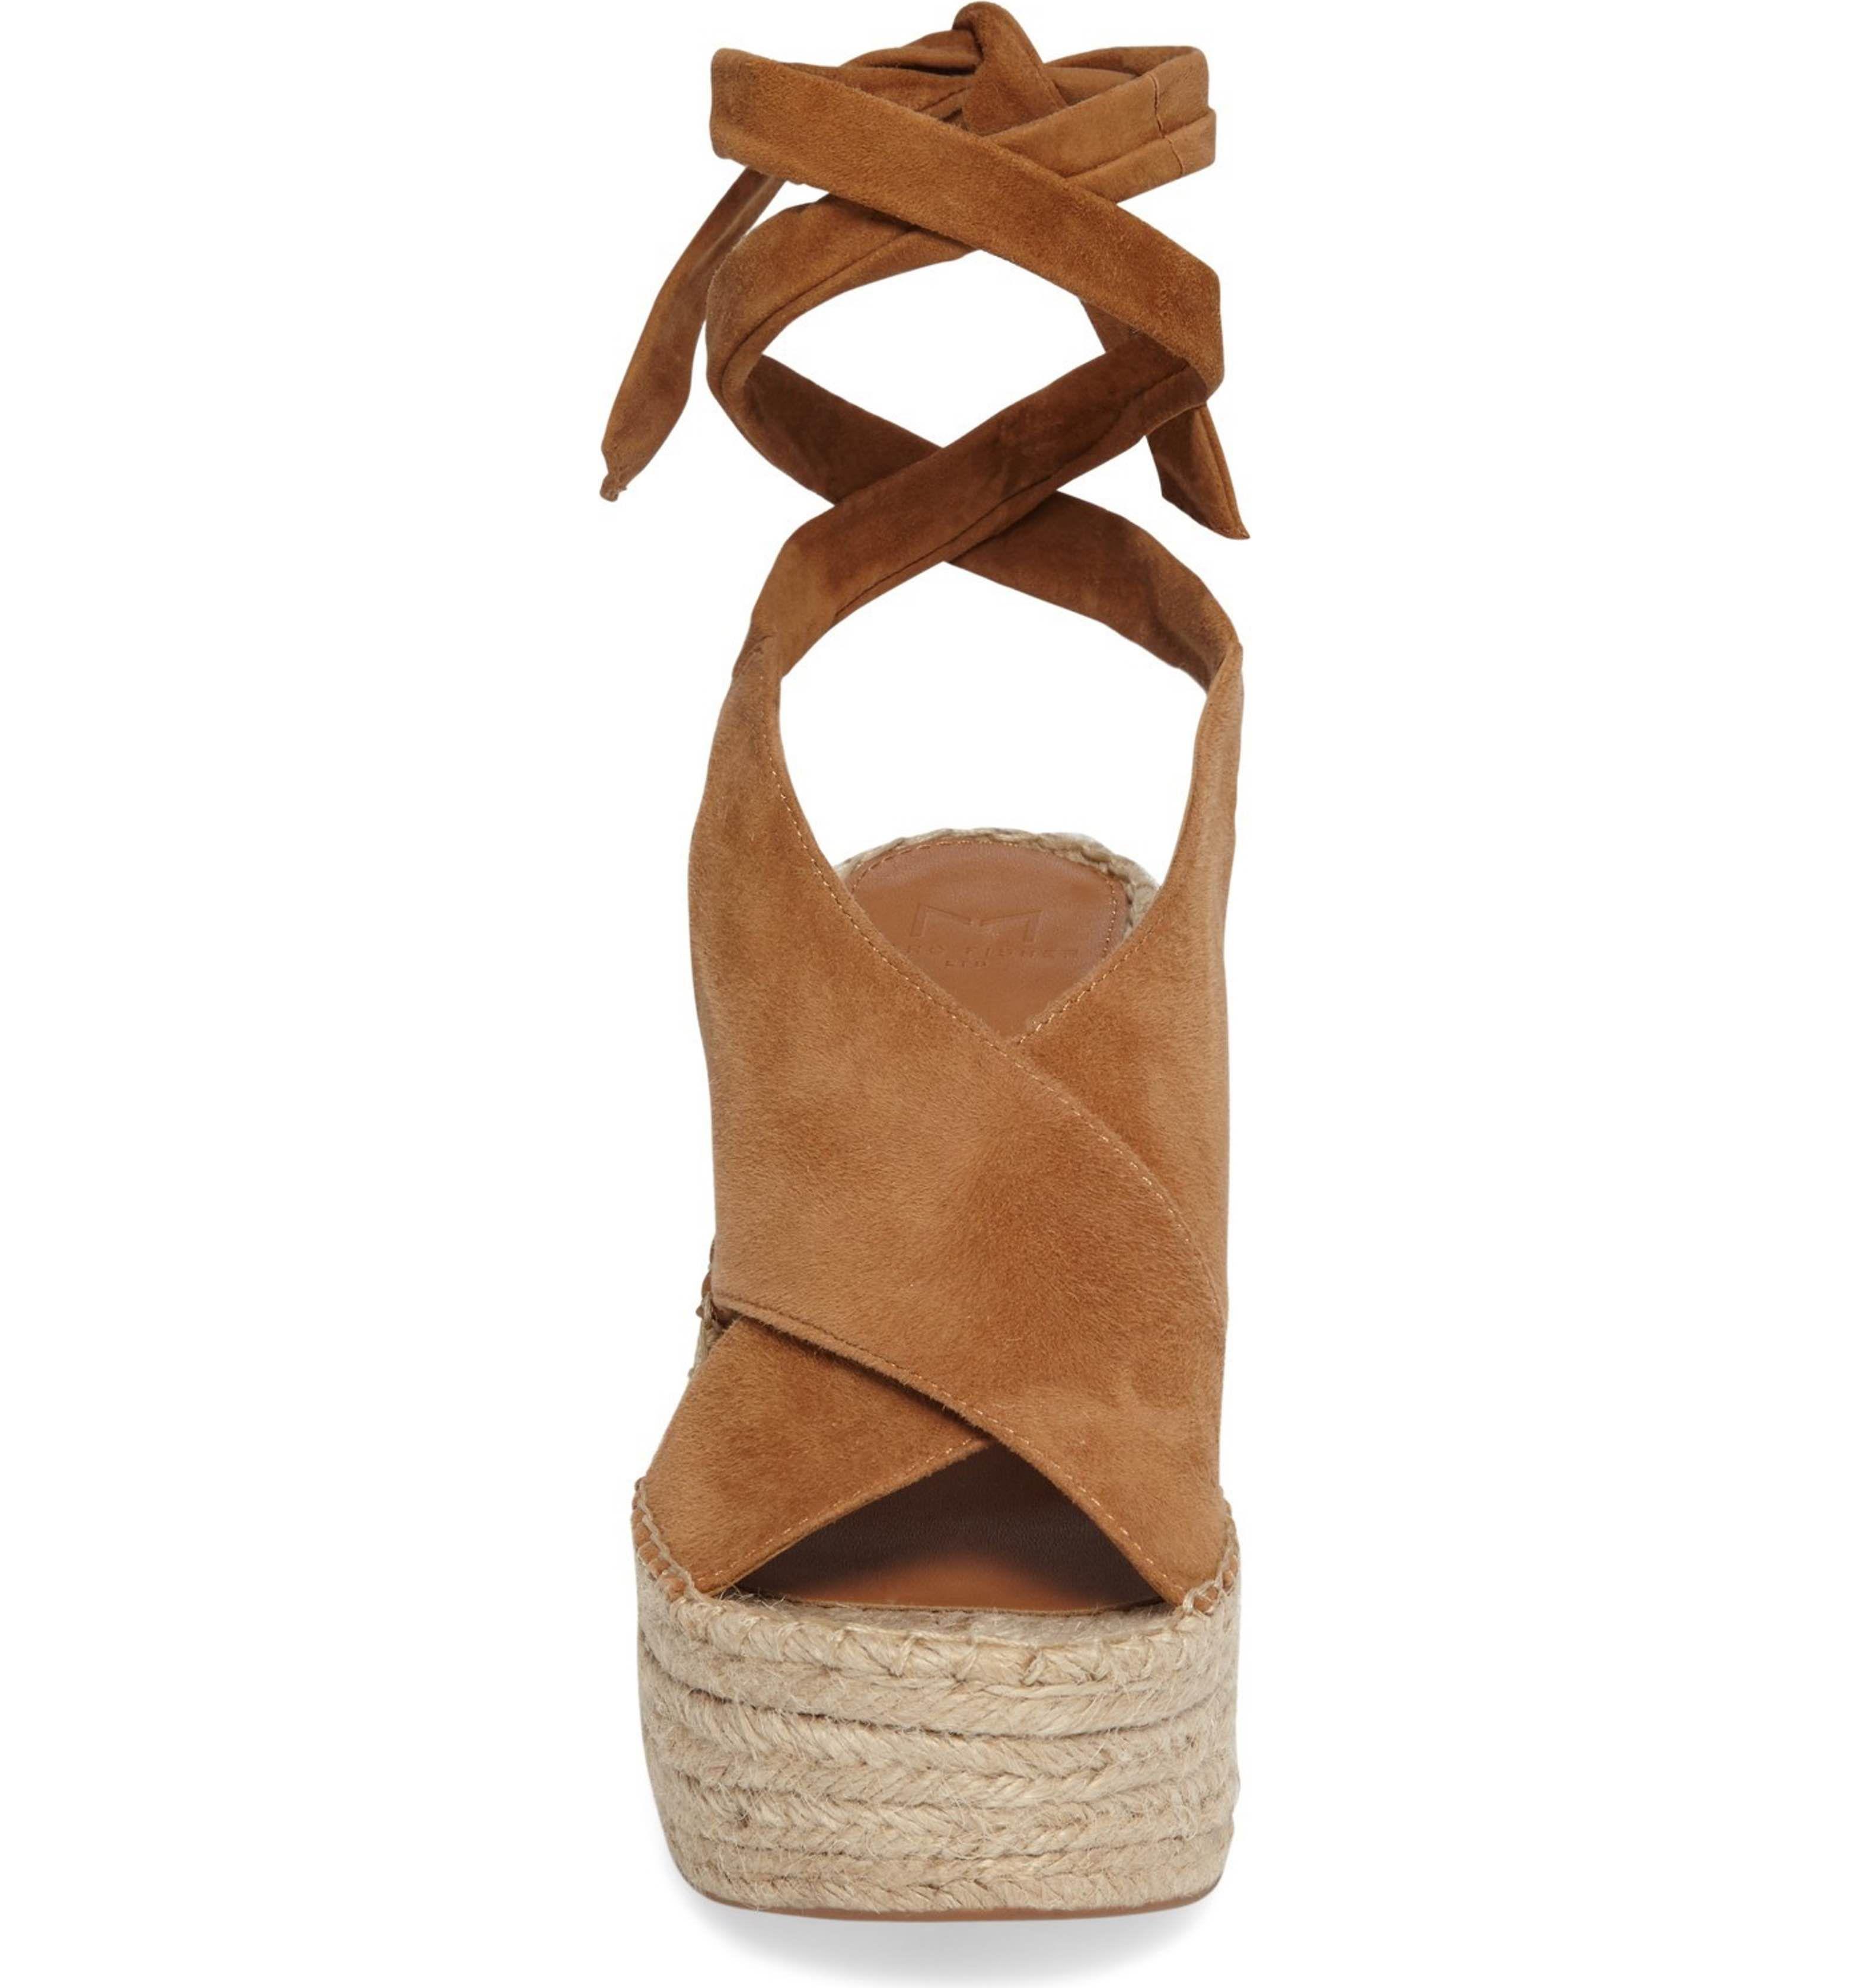 abd69bc44fec Main Image - Marc Fisher LTD Andira Platform Wedge Sandal (Women ...